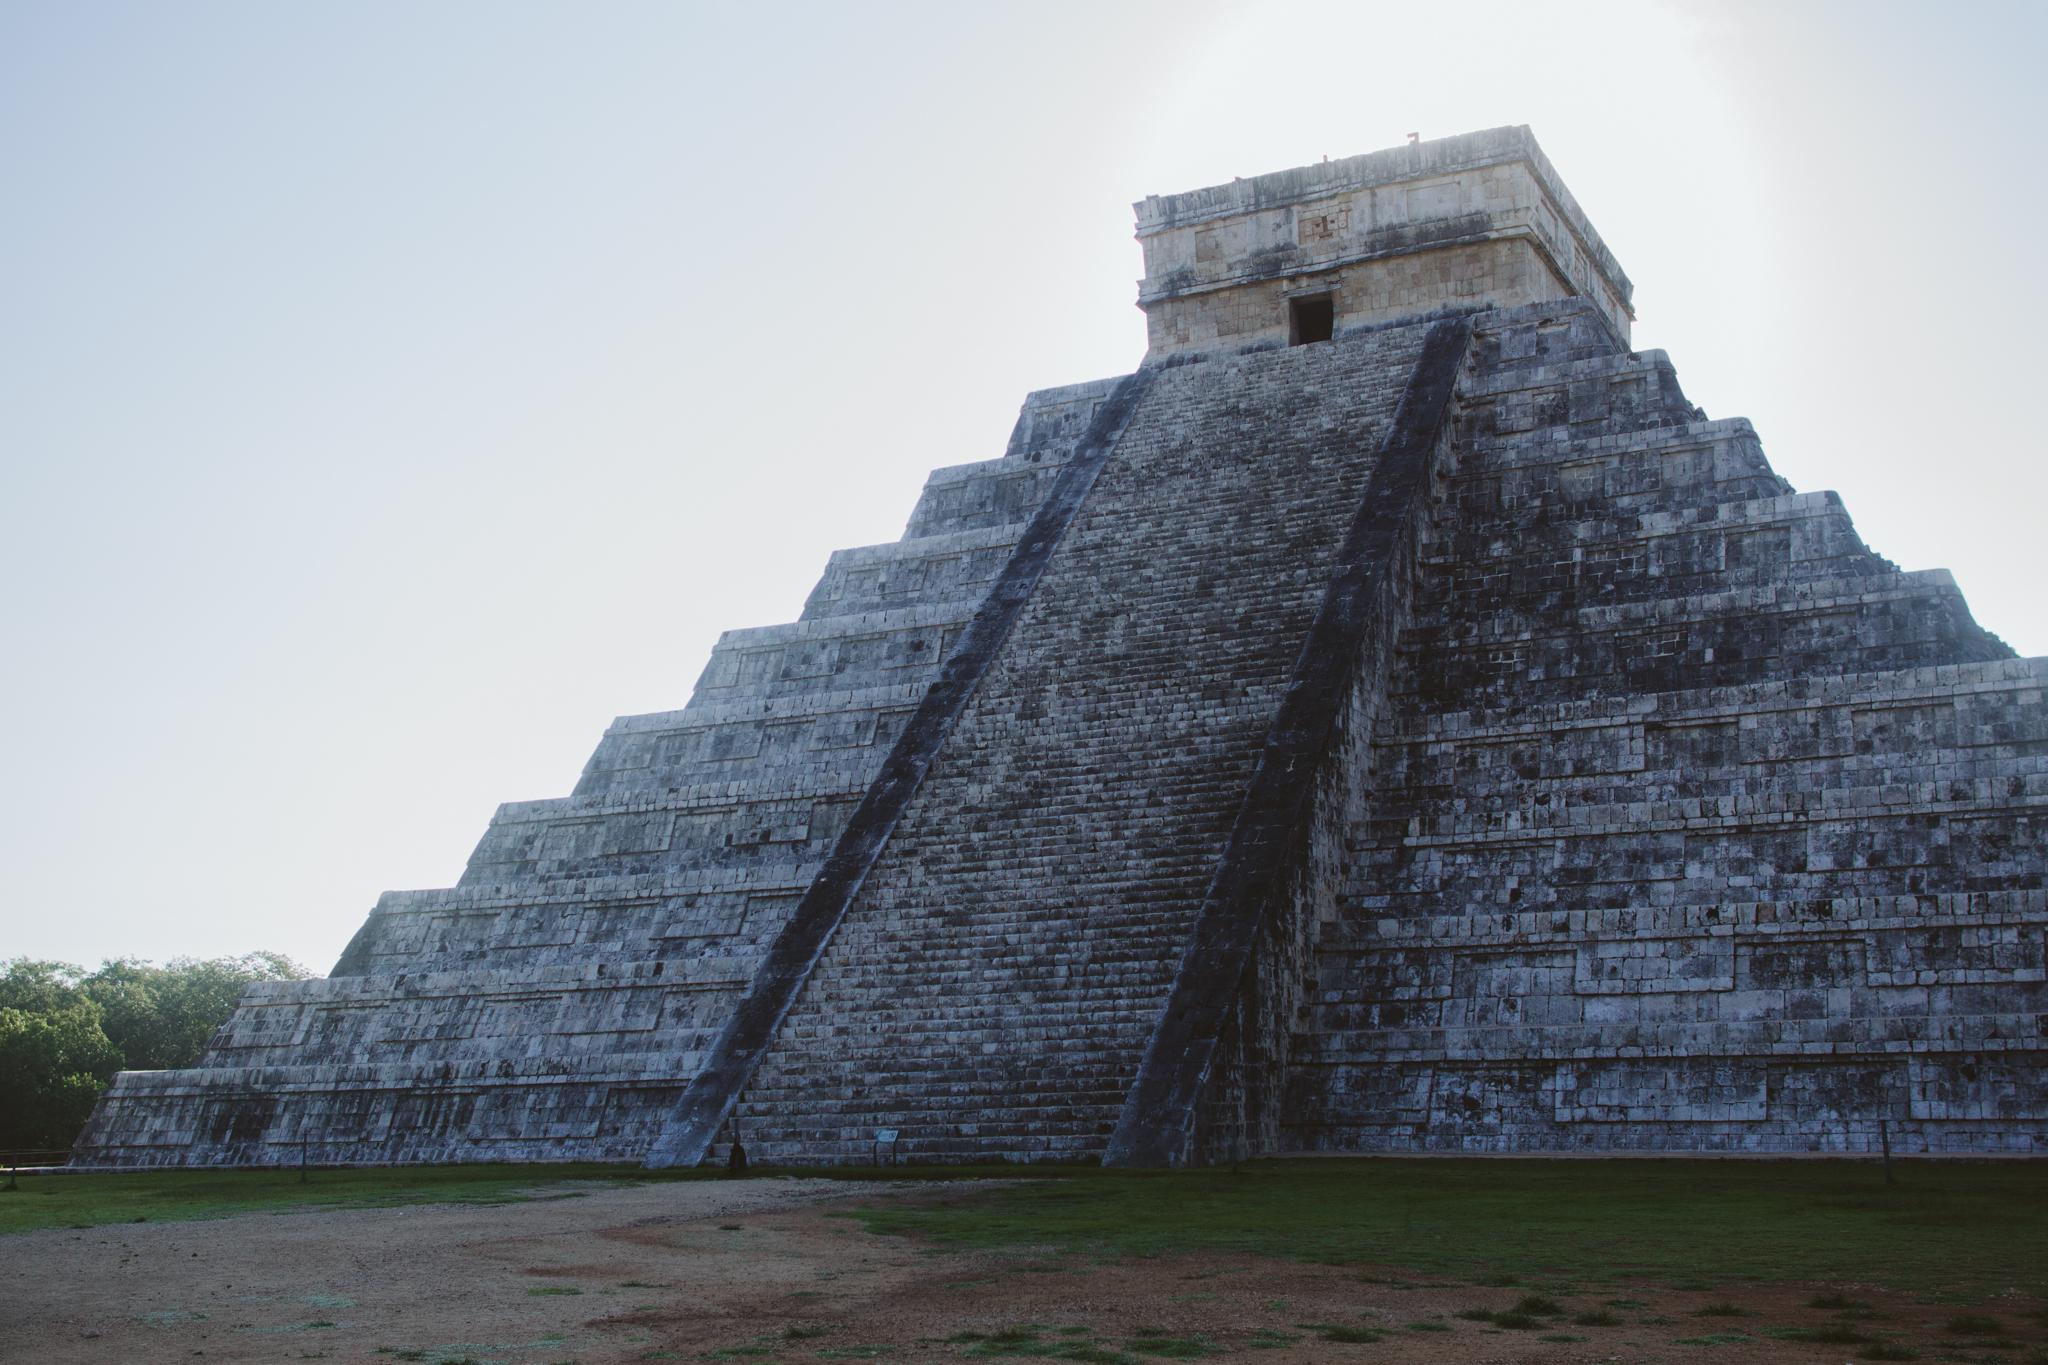 chichen-itza-pyramid-mexico-photography